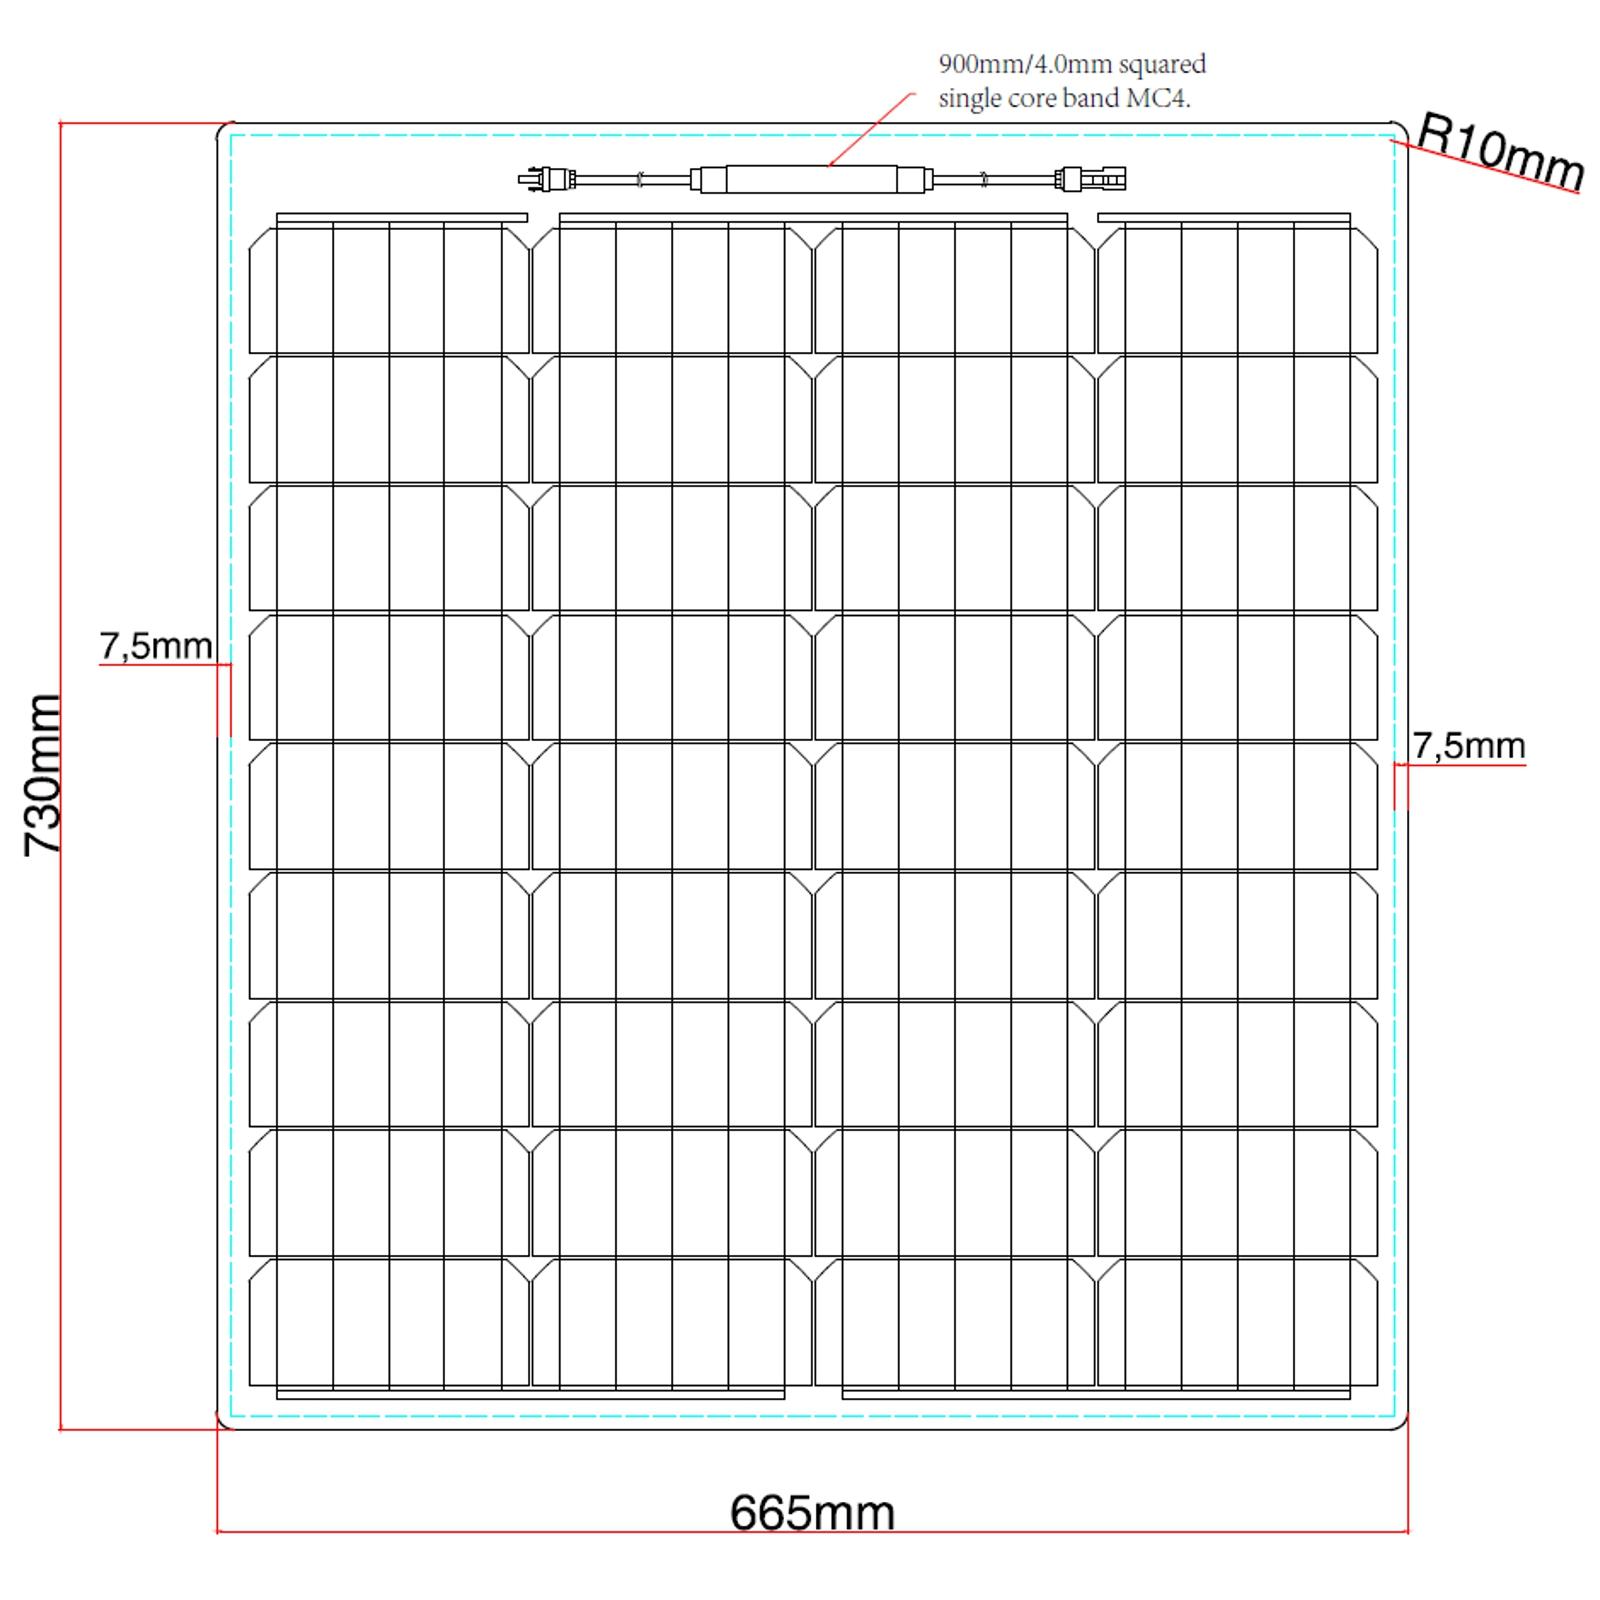 12v 100ah battery charger circuit diagram emg wiring solar panels charging kits for caravans motorhomes